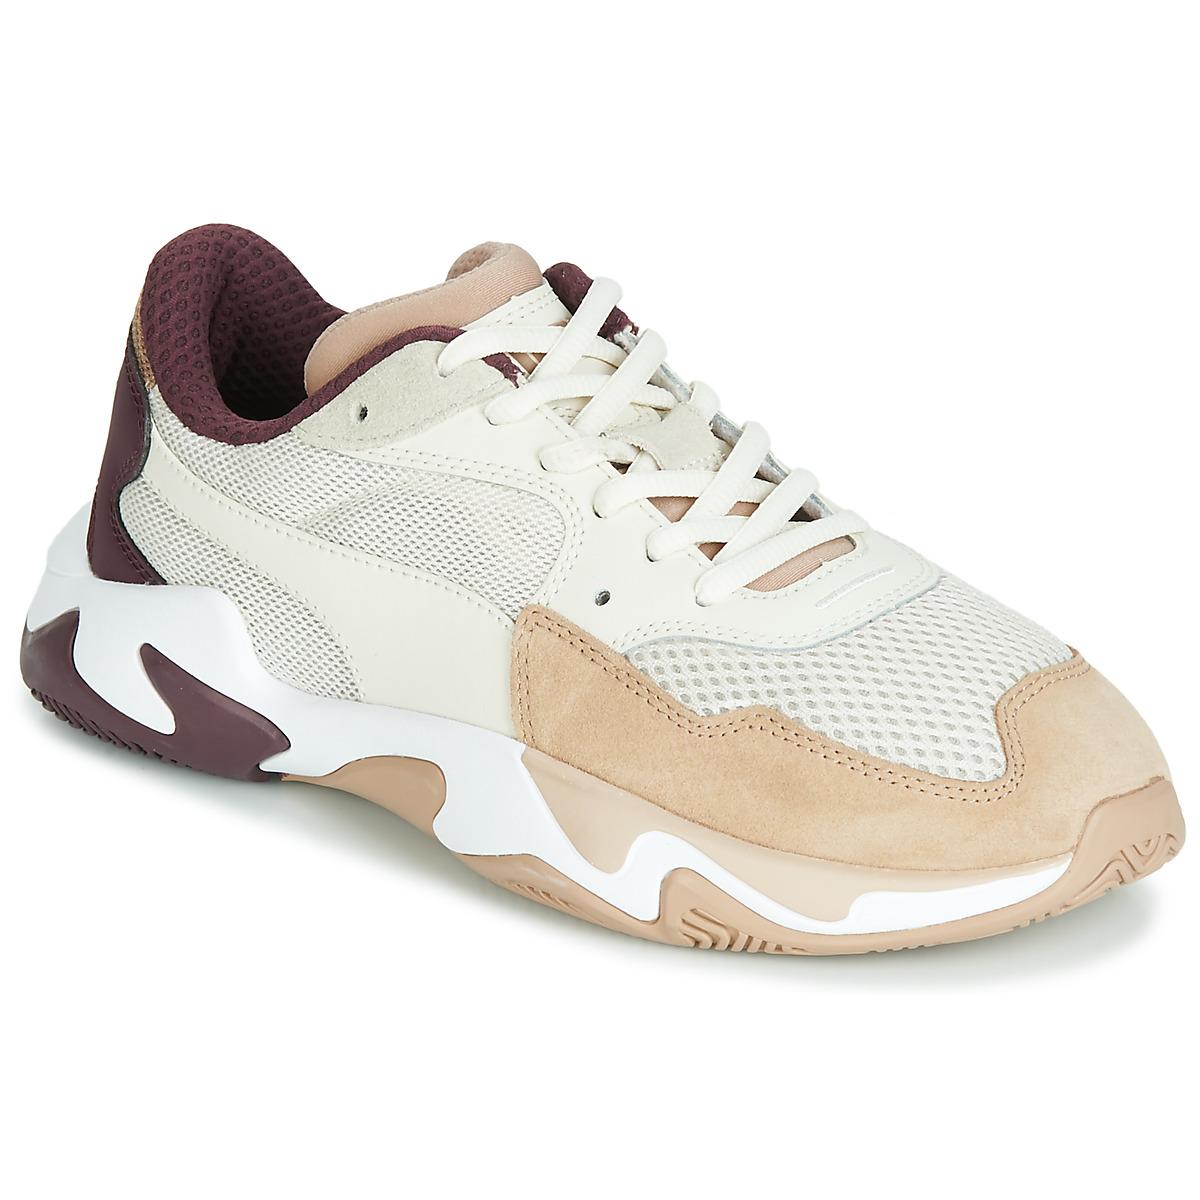 Puma STORM ORIGIN NOUGAT women's Shoes (Trainers) in White